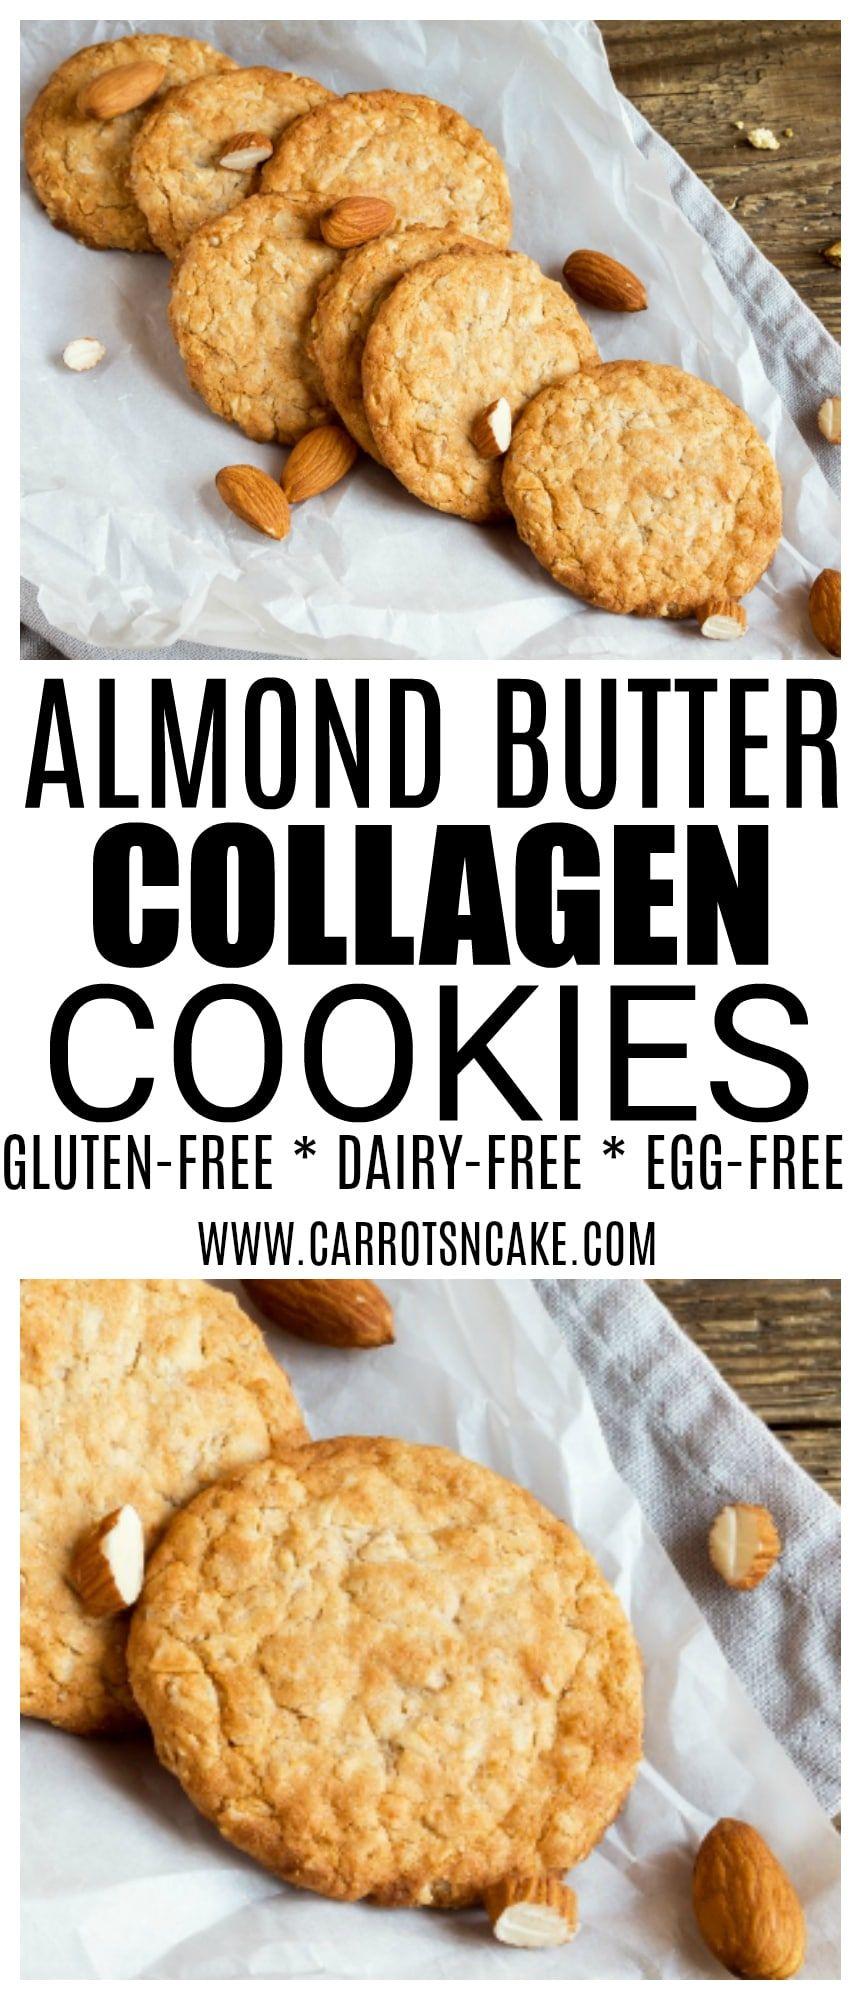 Almond Butter Collagen Cookies Recipe Collagen Recipes Almond